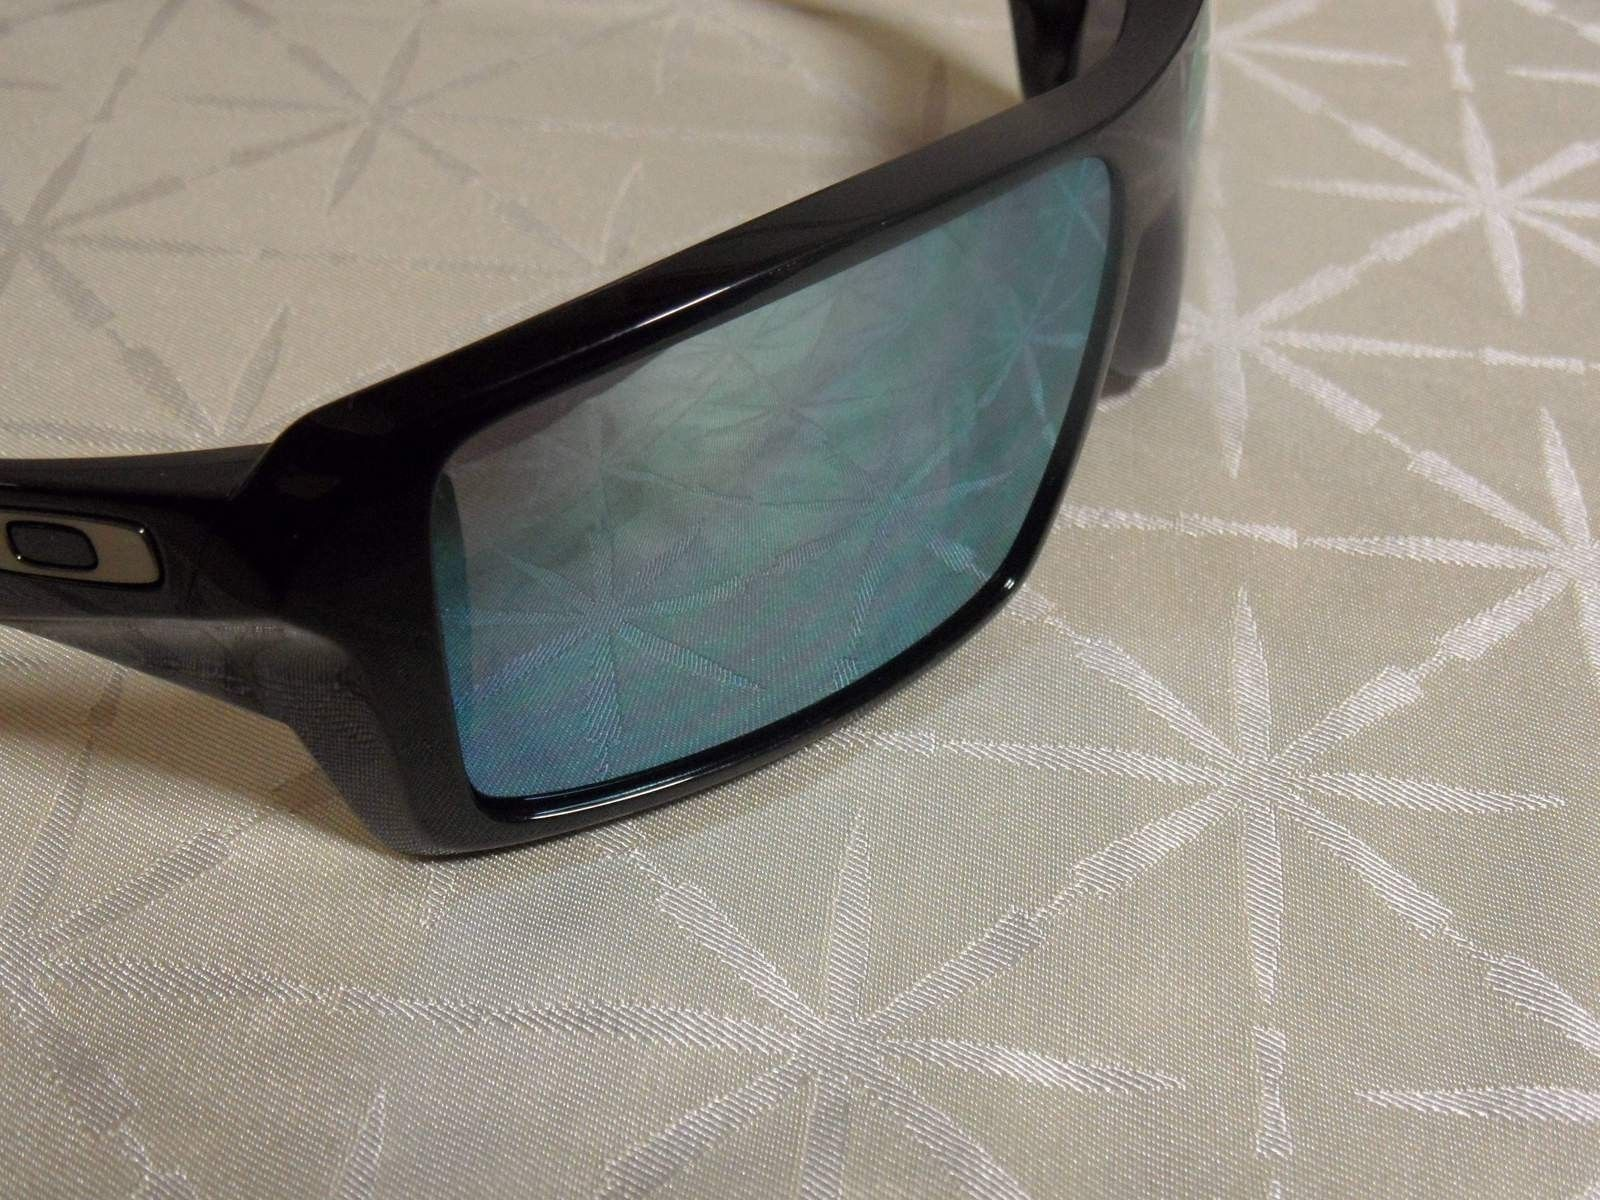 EP1 Polished Black Emerald - rp7kq3fl.jpg